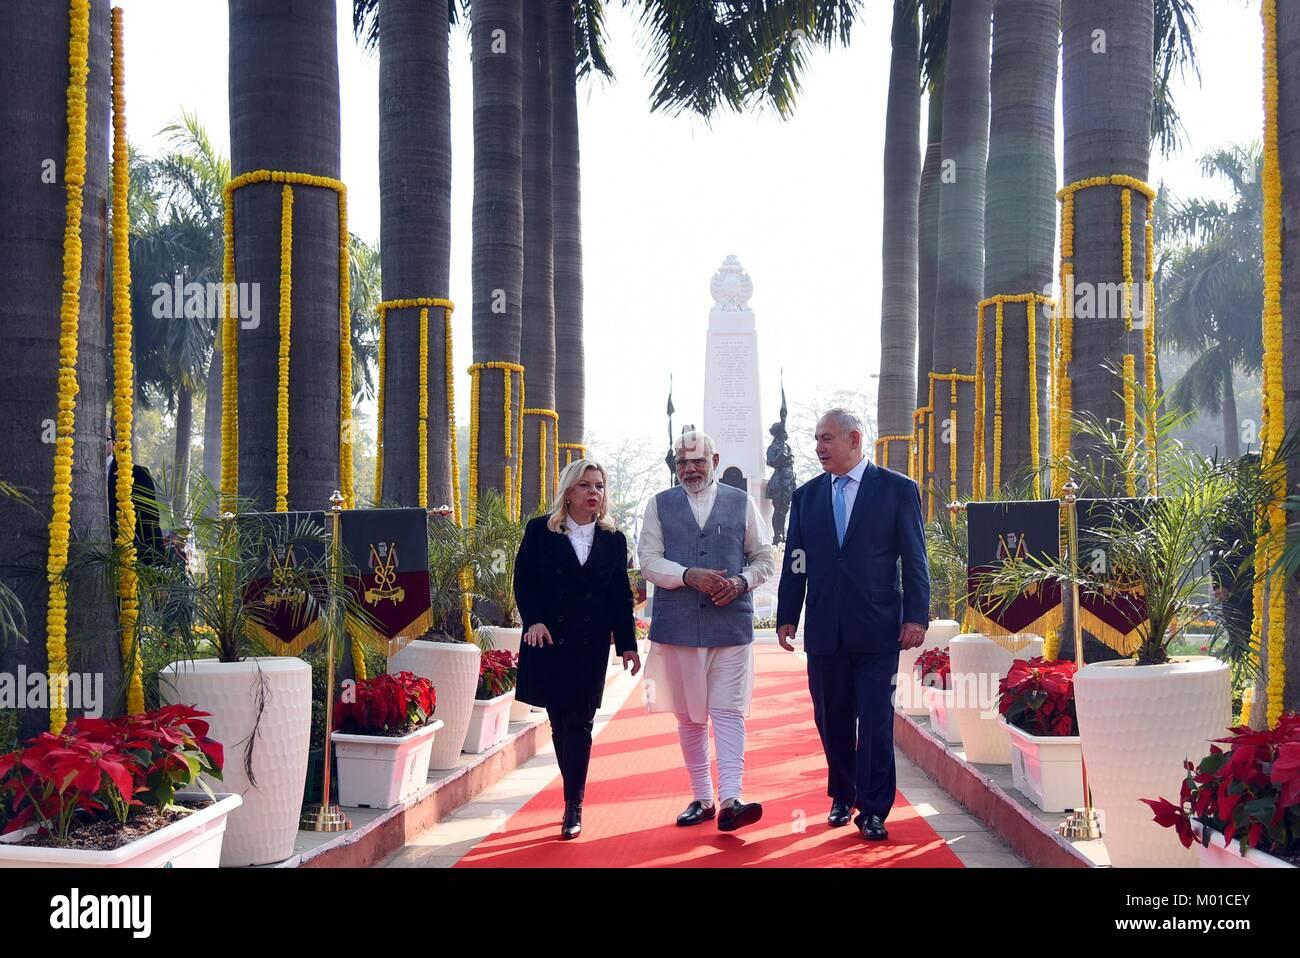 Indian Prime Minister Narendra Modi escorts Israeli Prime Minister Benjamin Netanyahu and wife Sara Netanyahu, left, - Stock Image